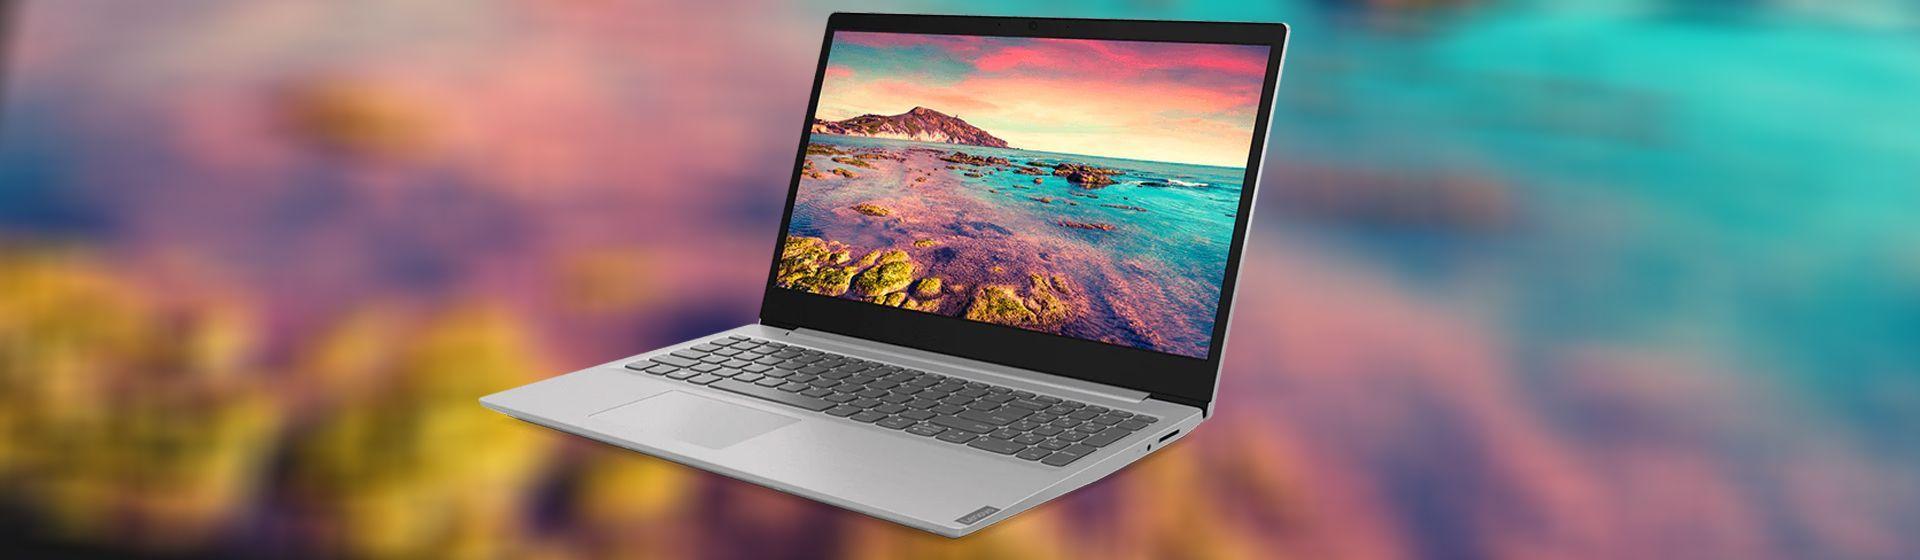 IdeaPad S145 (Ryzen 7) é bom? Veja análise do notebook com SSD